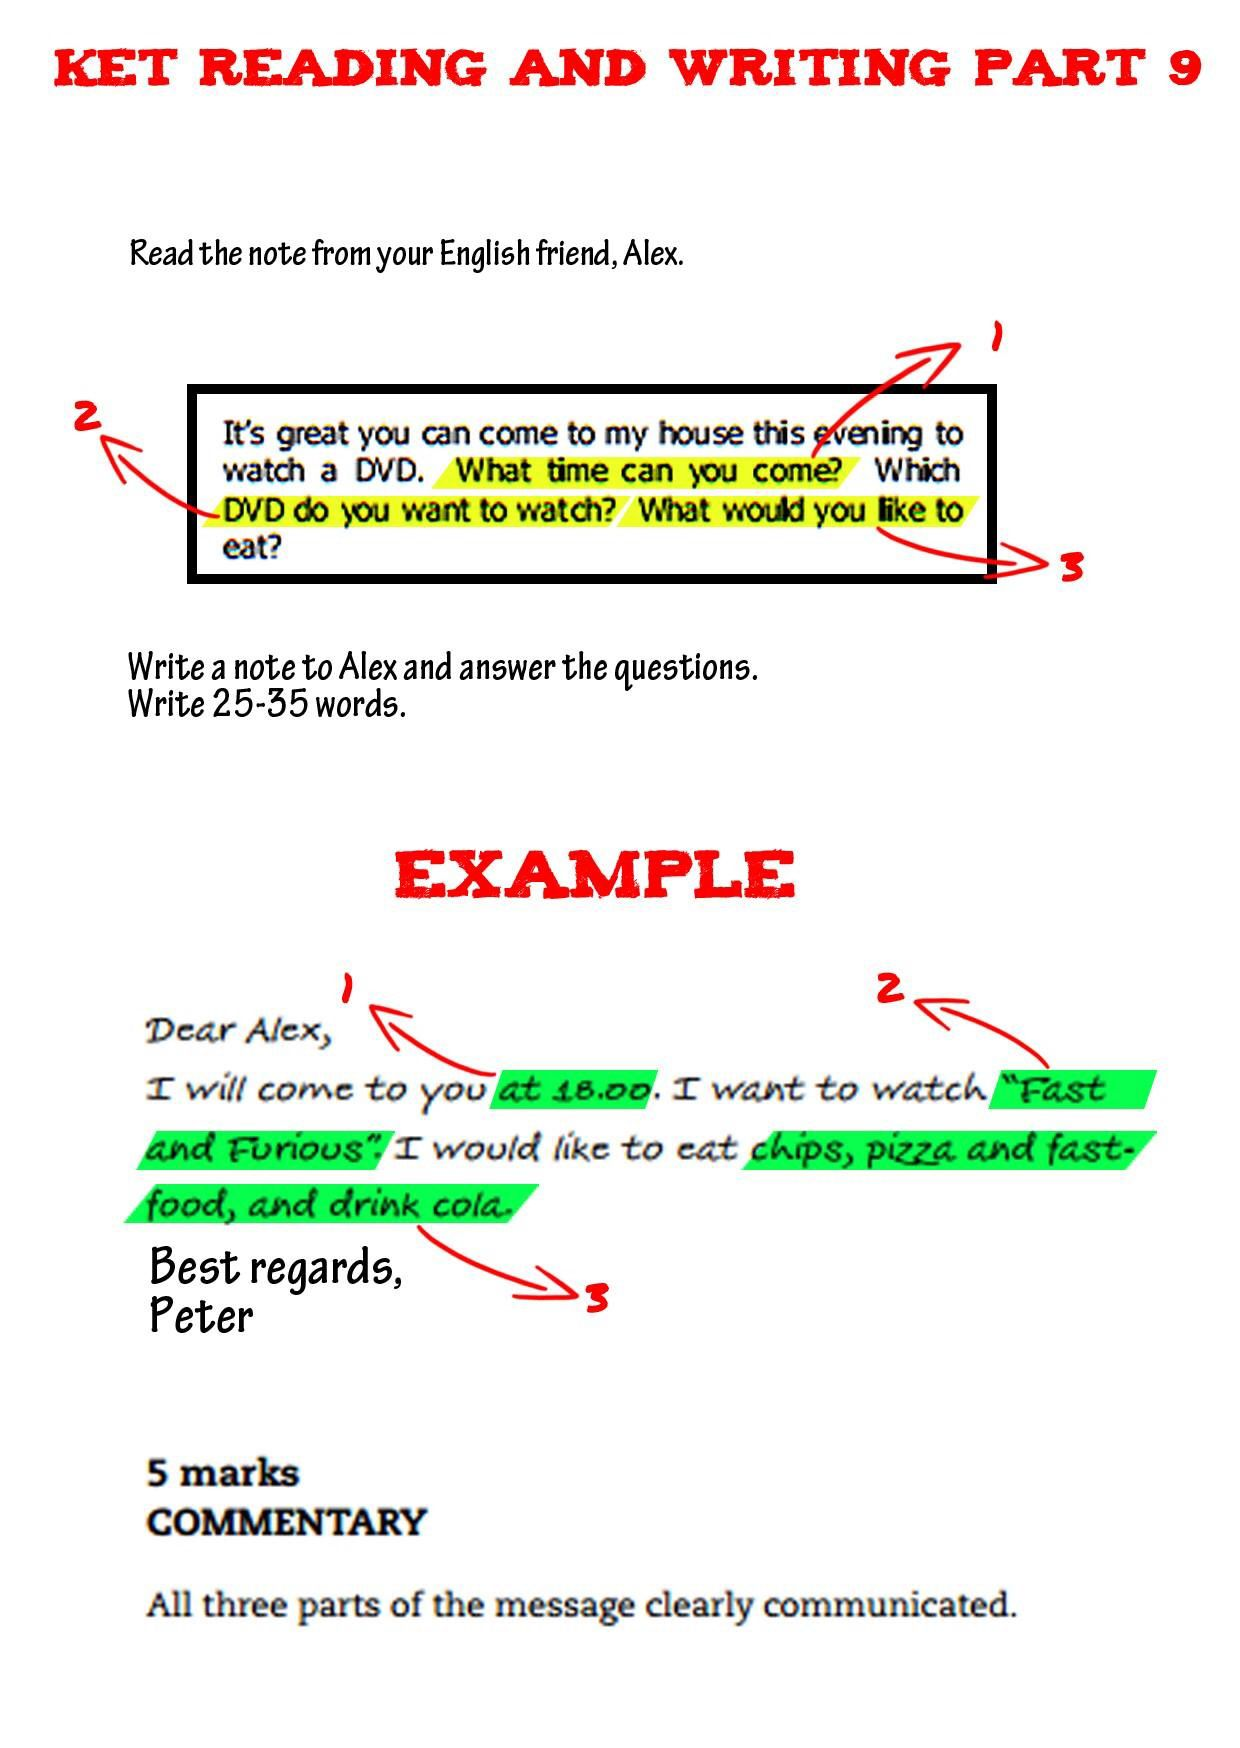 Cambridge Ket Exam Writing Part Clase De Inglés Educacion Aprender Inglés